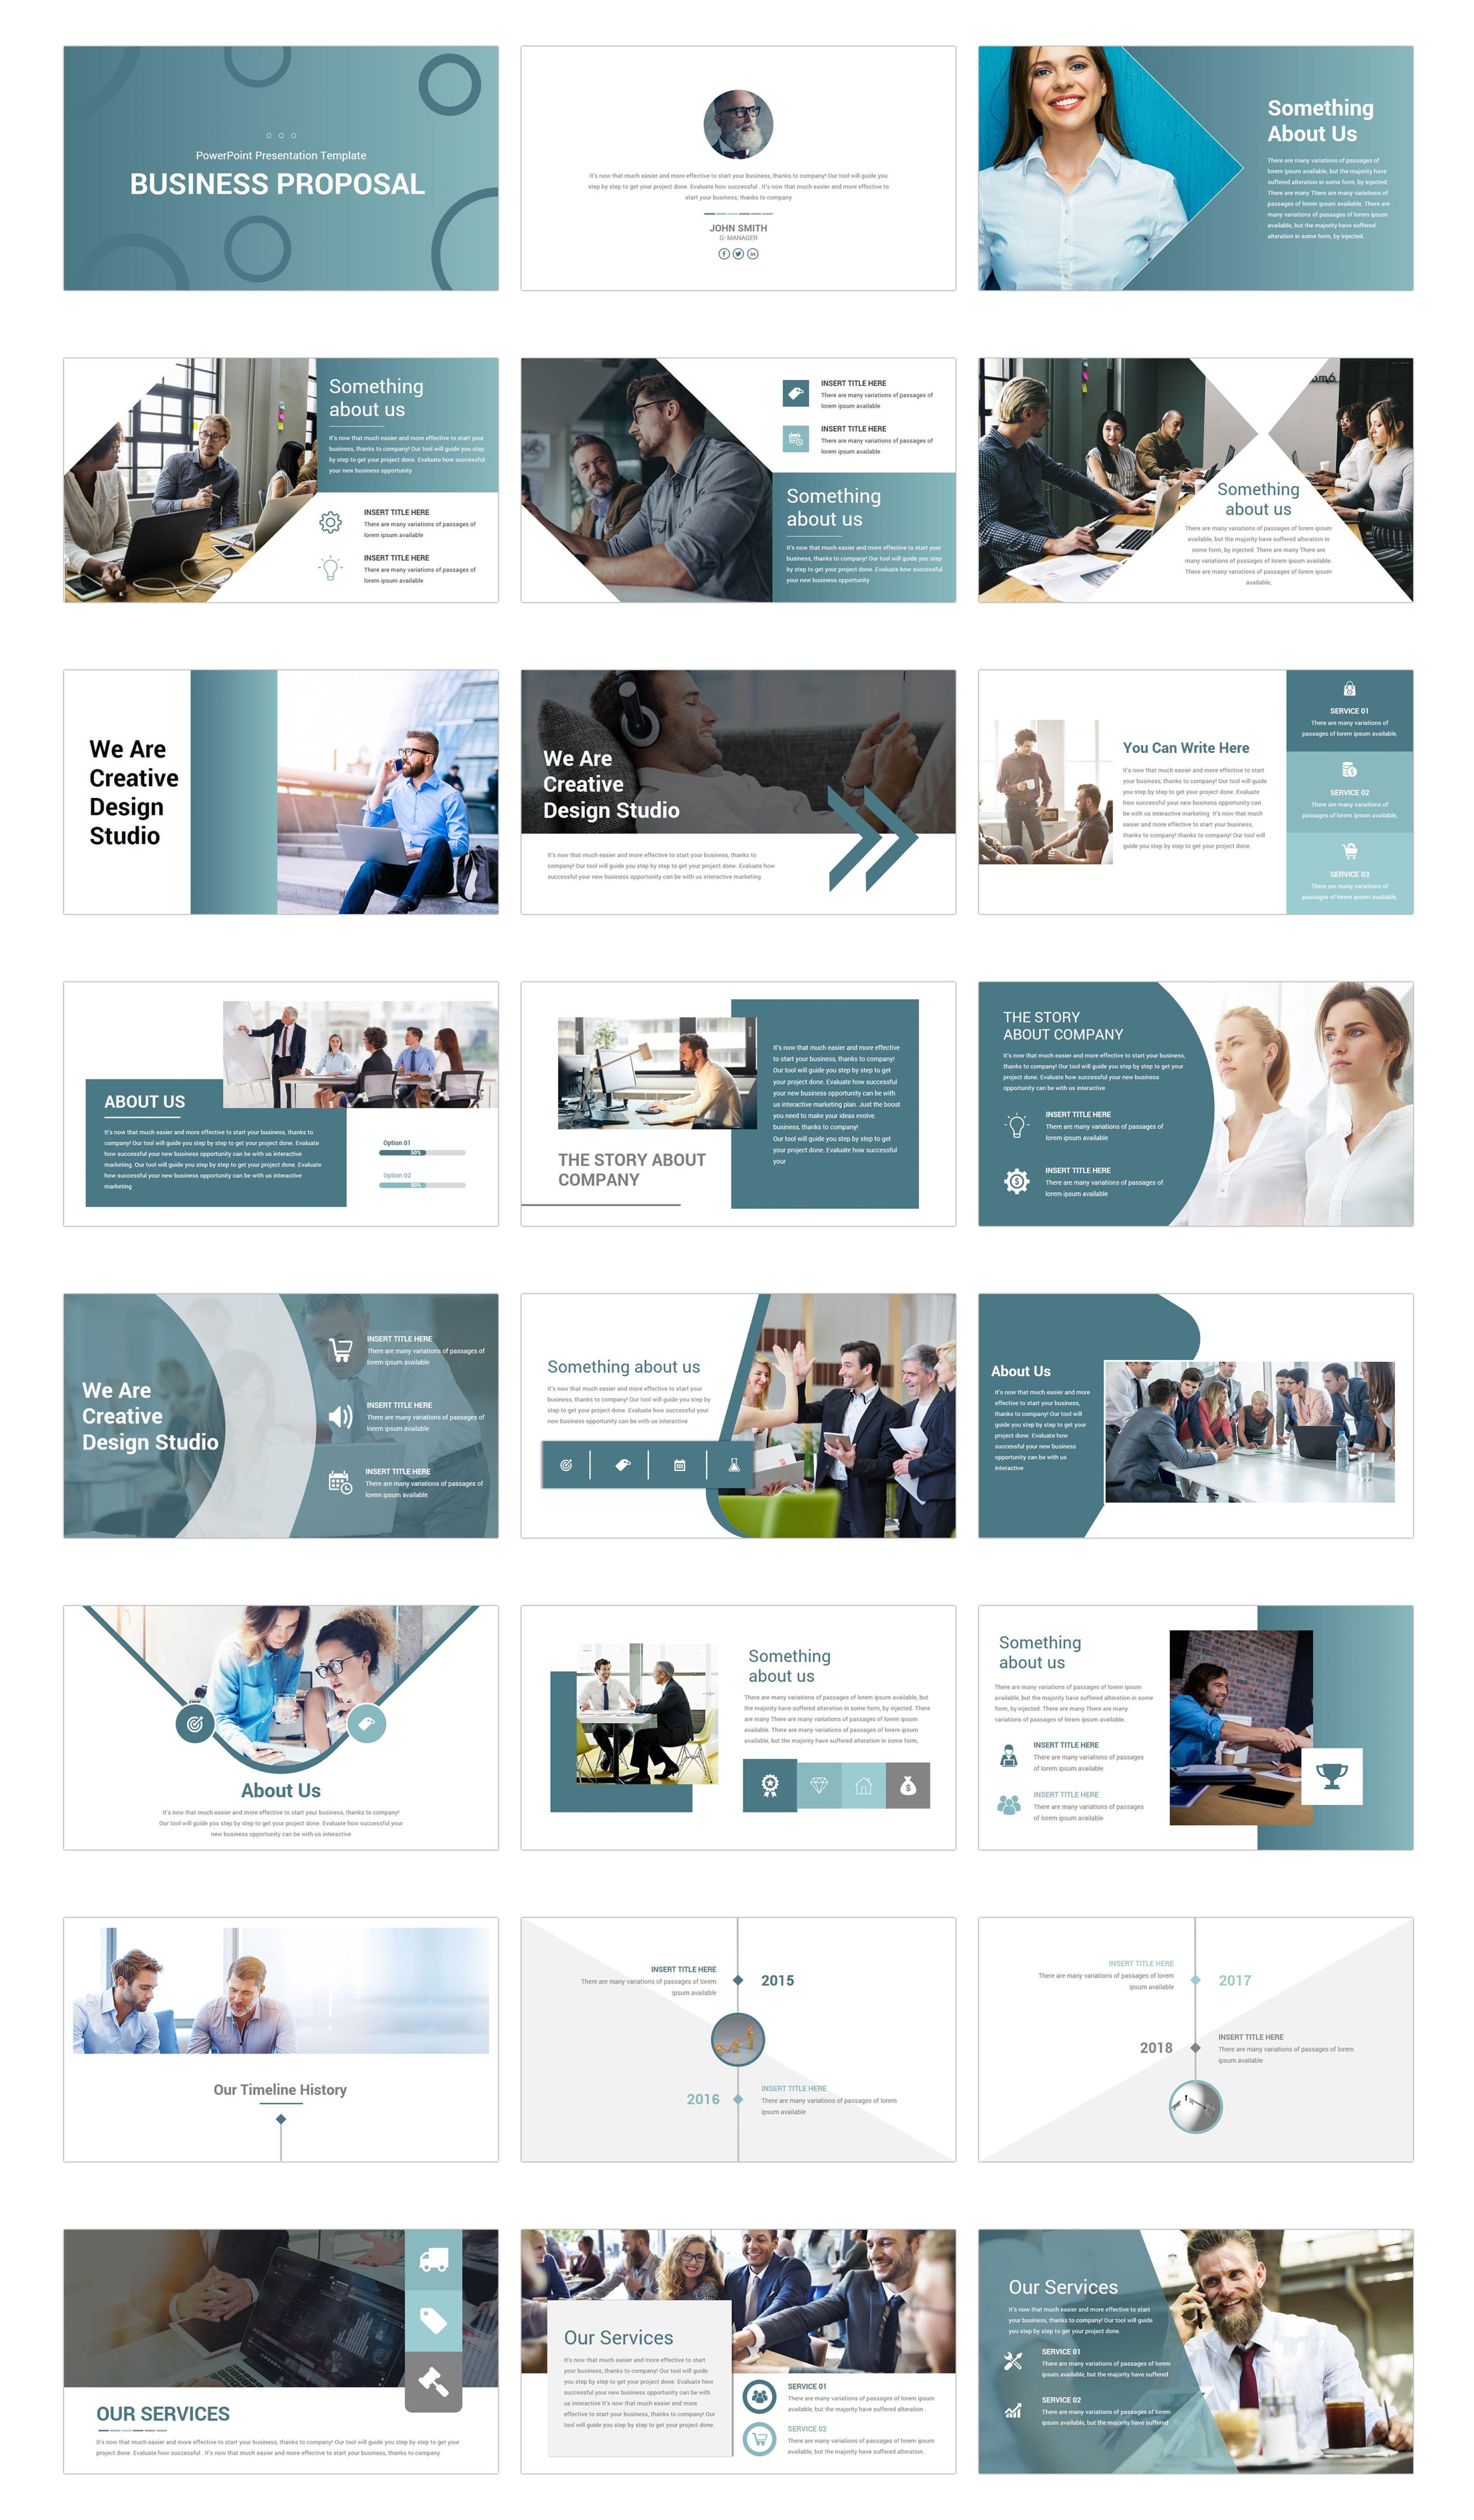 Resume Template Power Point Template Web Design Instagram Ideas Layout Ideas Web Design Proposal Business Proposal Web Template Design